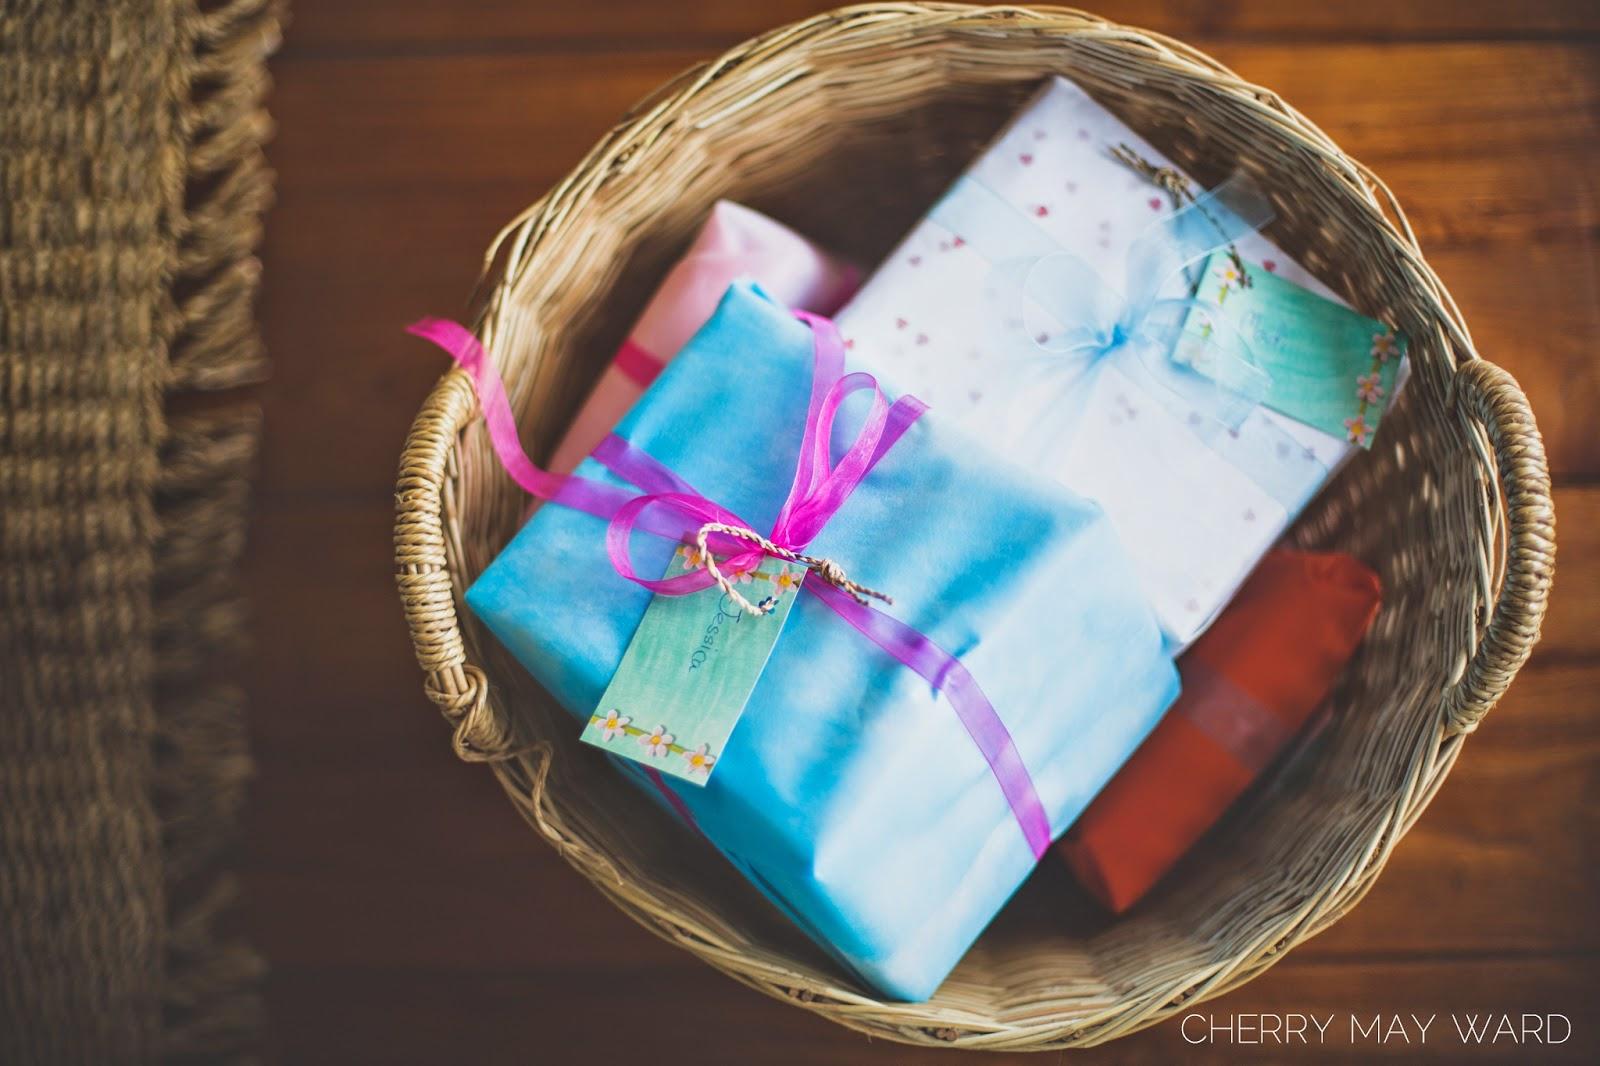 wedding gifts, Koh Samui wedding, Thailand, Getting married in Thailand, gifts in a basket, Koh Samui professional wedding photographer,